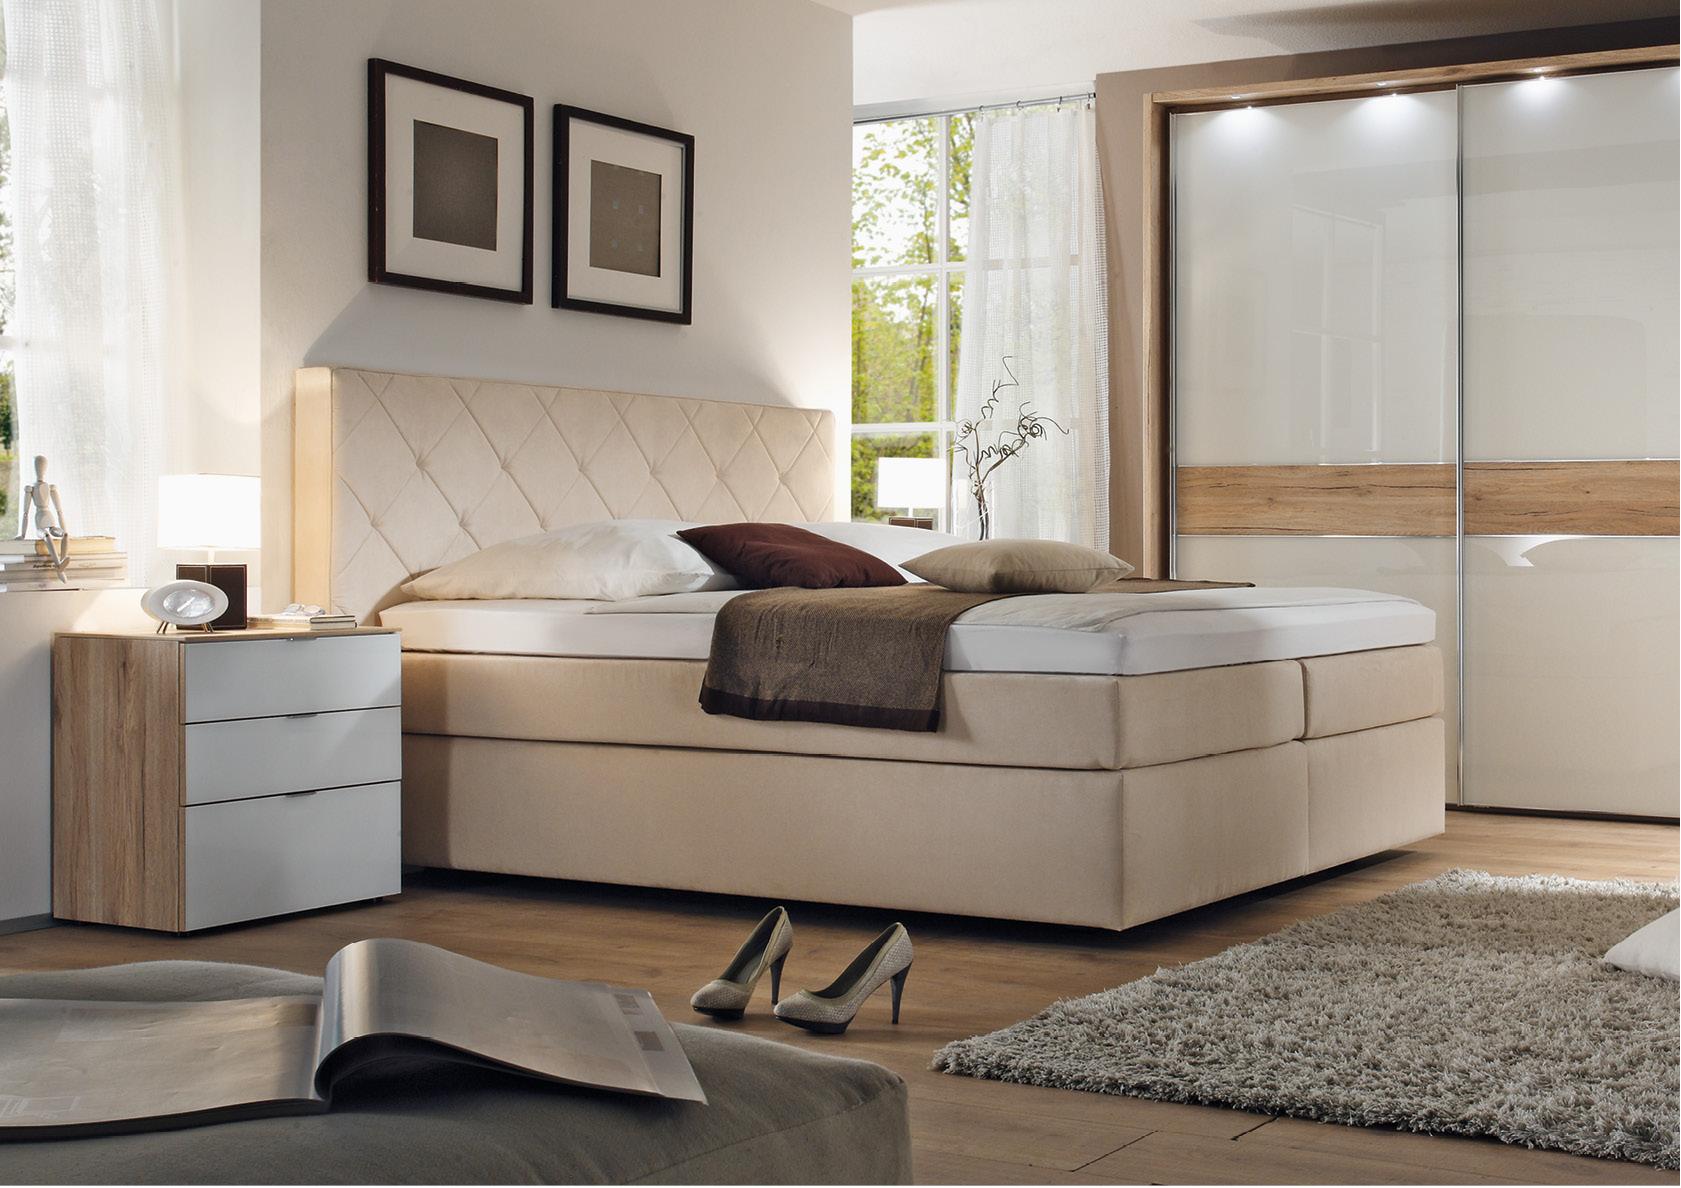 schlafen m bel bohn gmbh in hilchenbach m sen. Black Bedroom Furniture Sets. Home Design Ideas